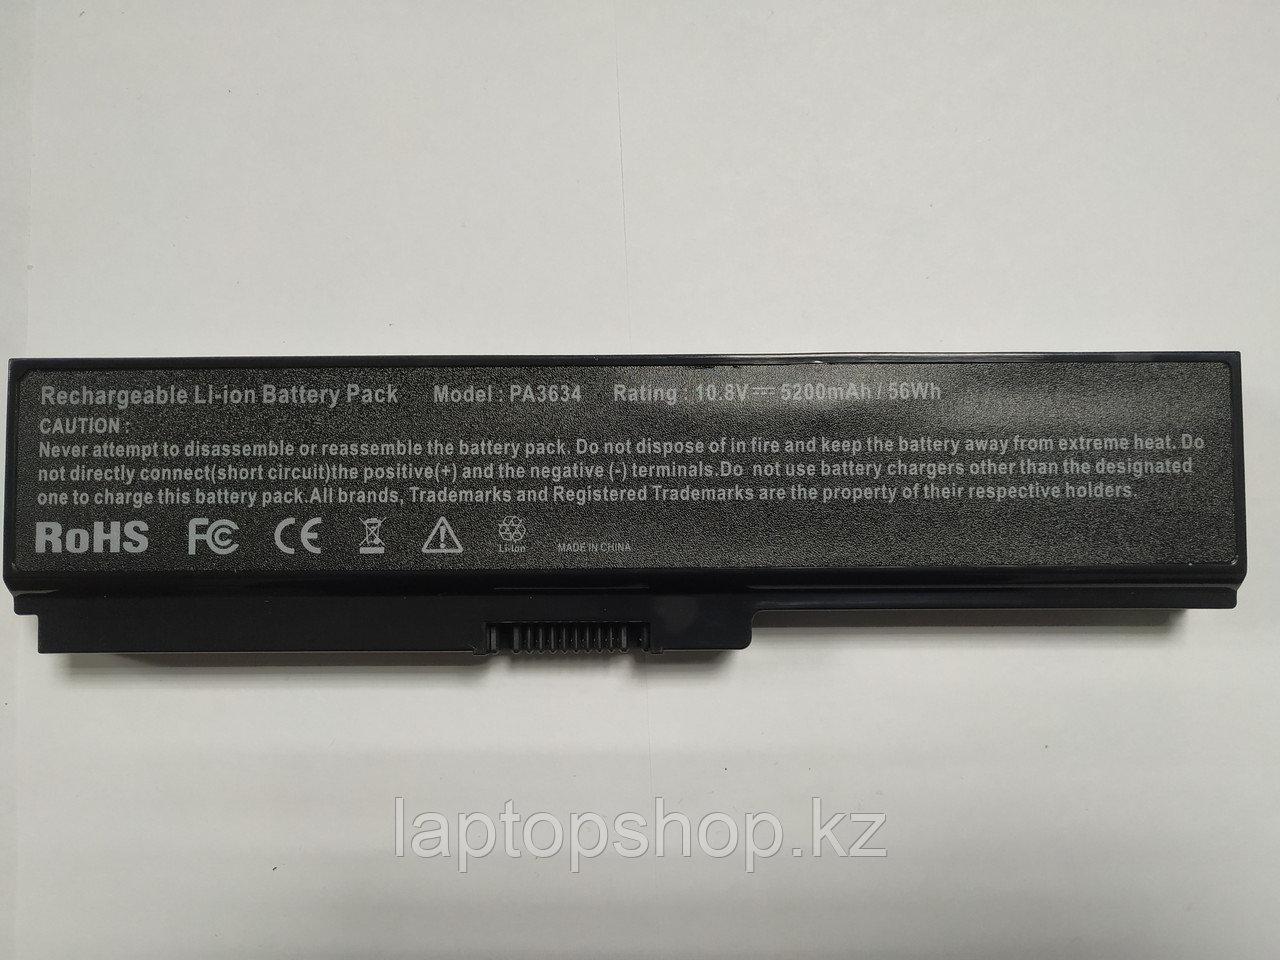 Батарея для ноутбука Совместимая for Toshiba PA3634U